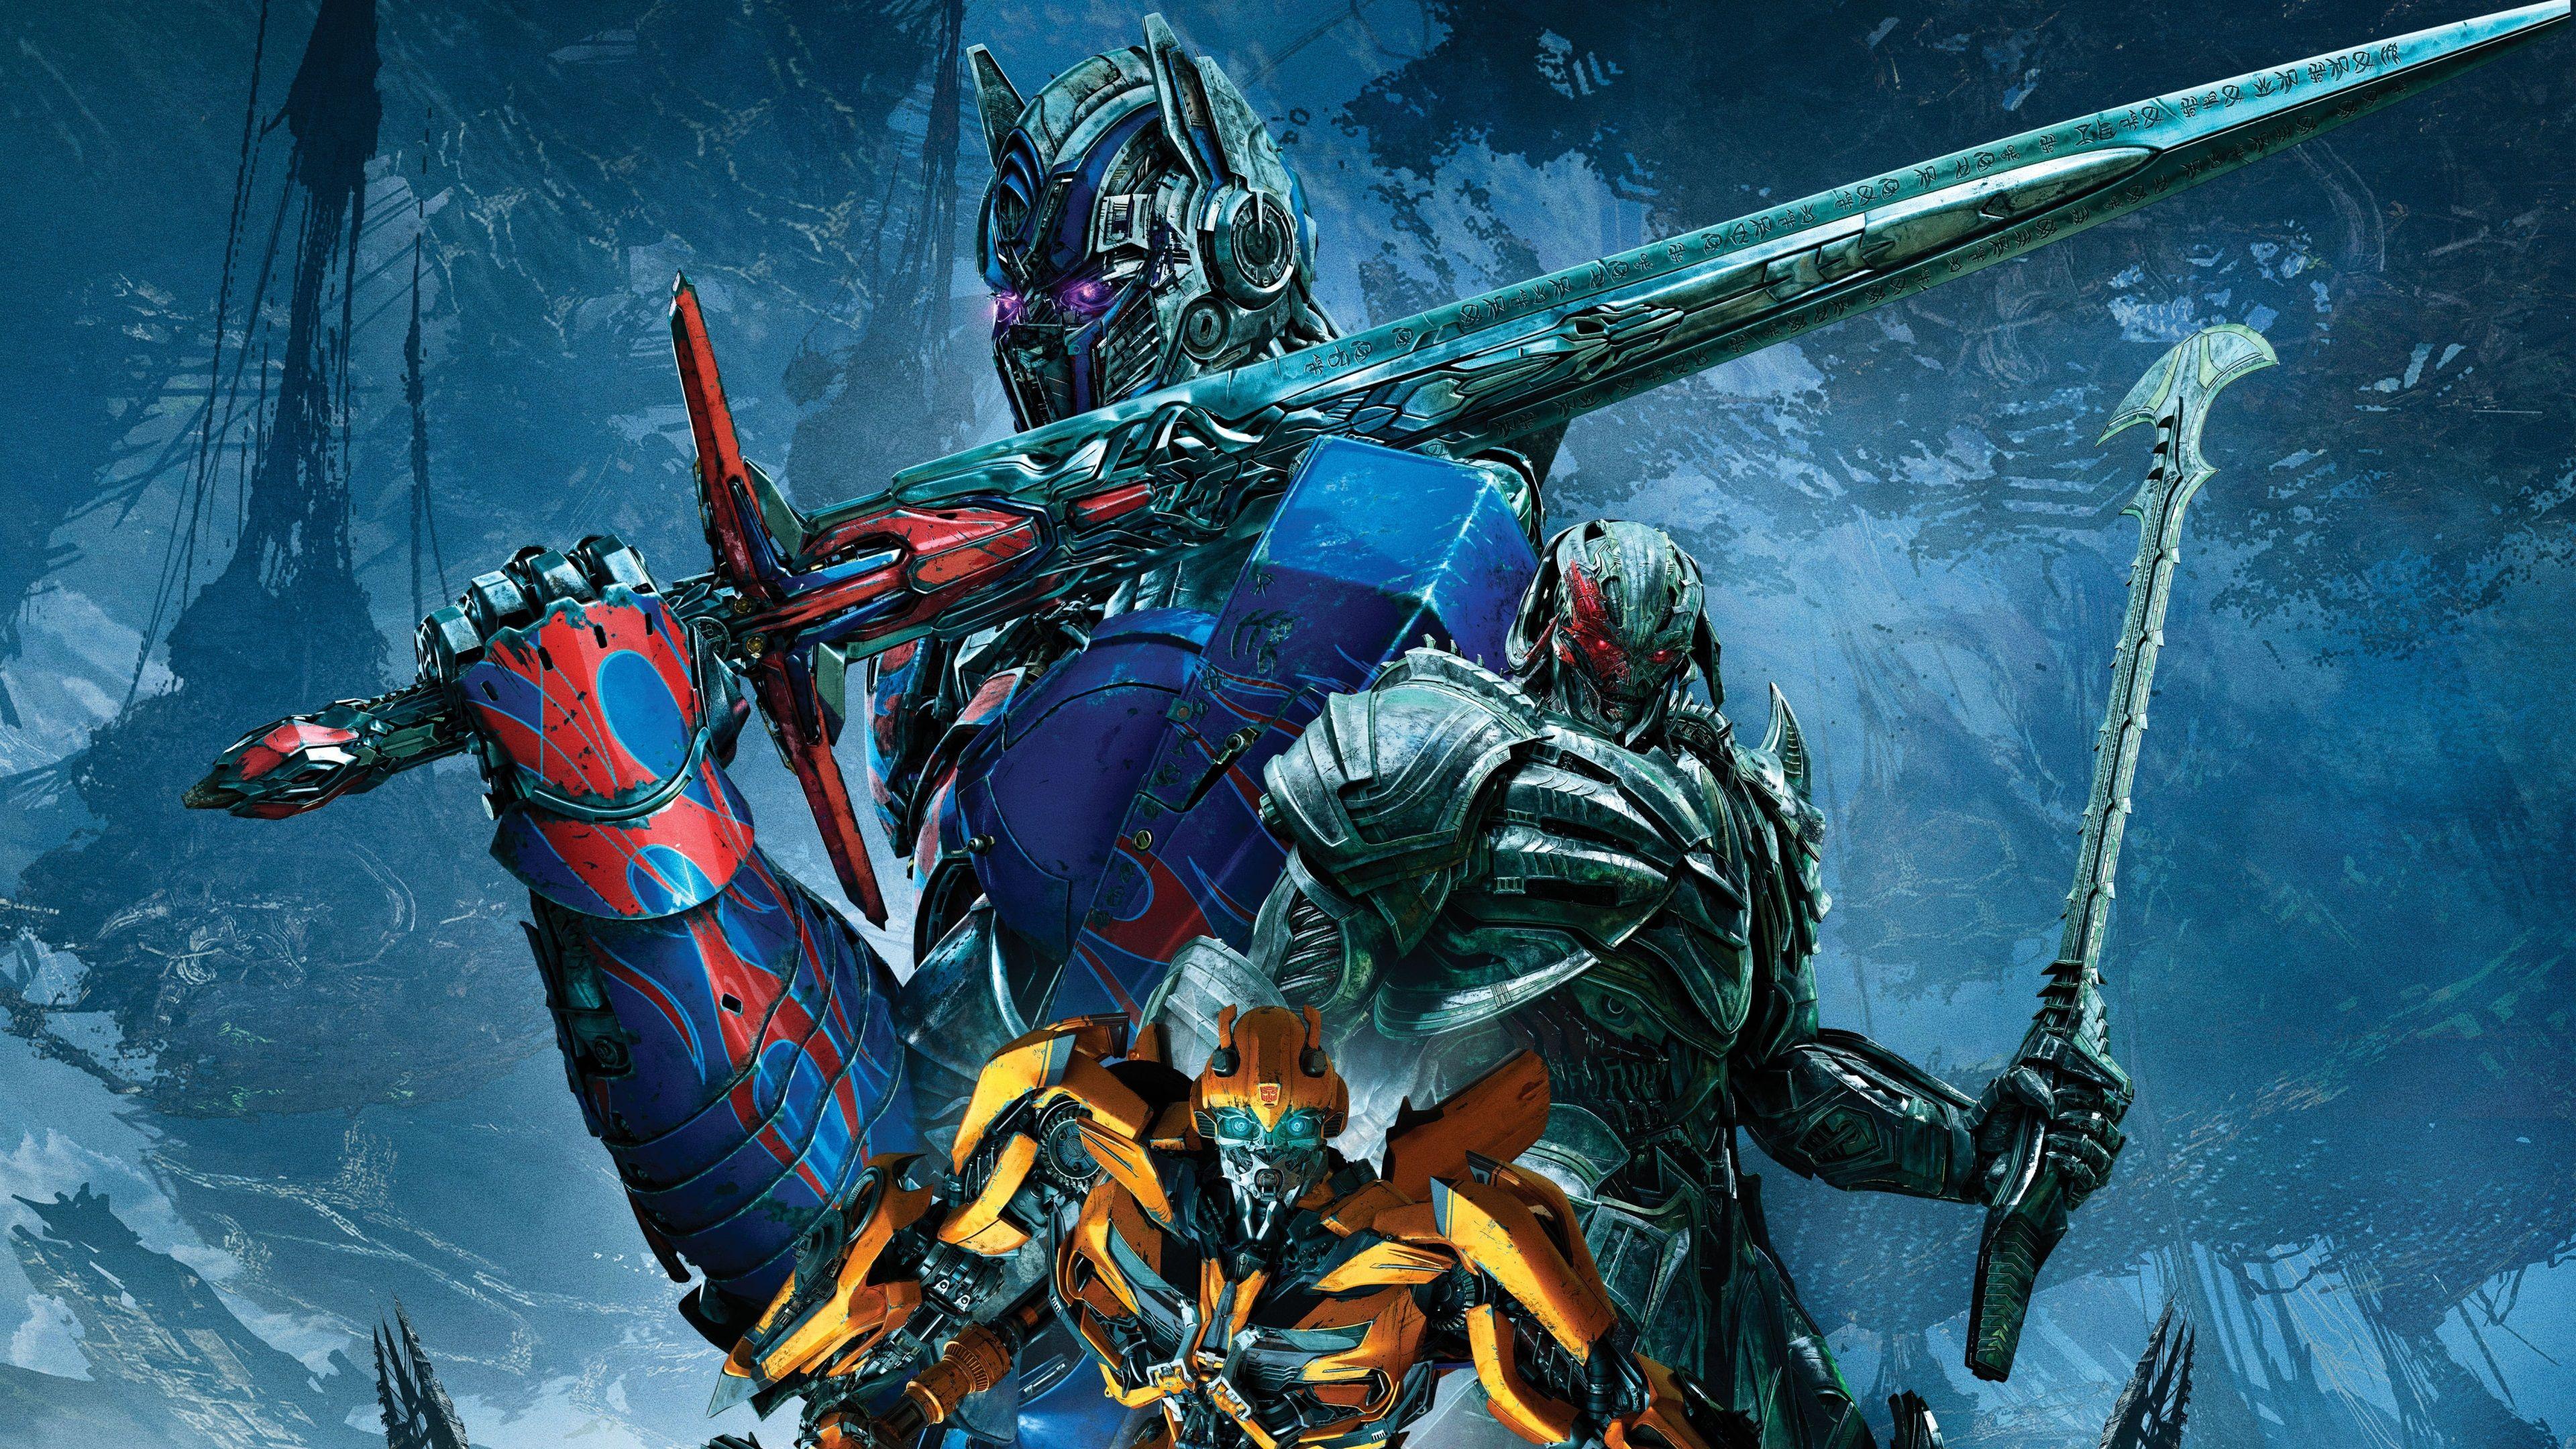 3840x2160 Transformers The Last Knight 4k Pc Desktop Wallpaper Hd Optimus Prime Wallpaper Transformers Optimus Prime